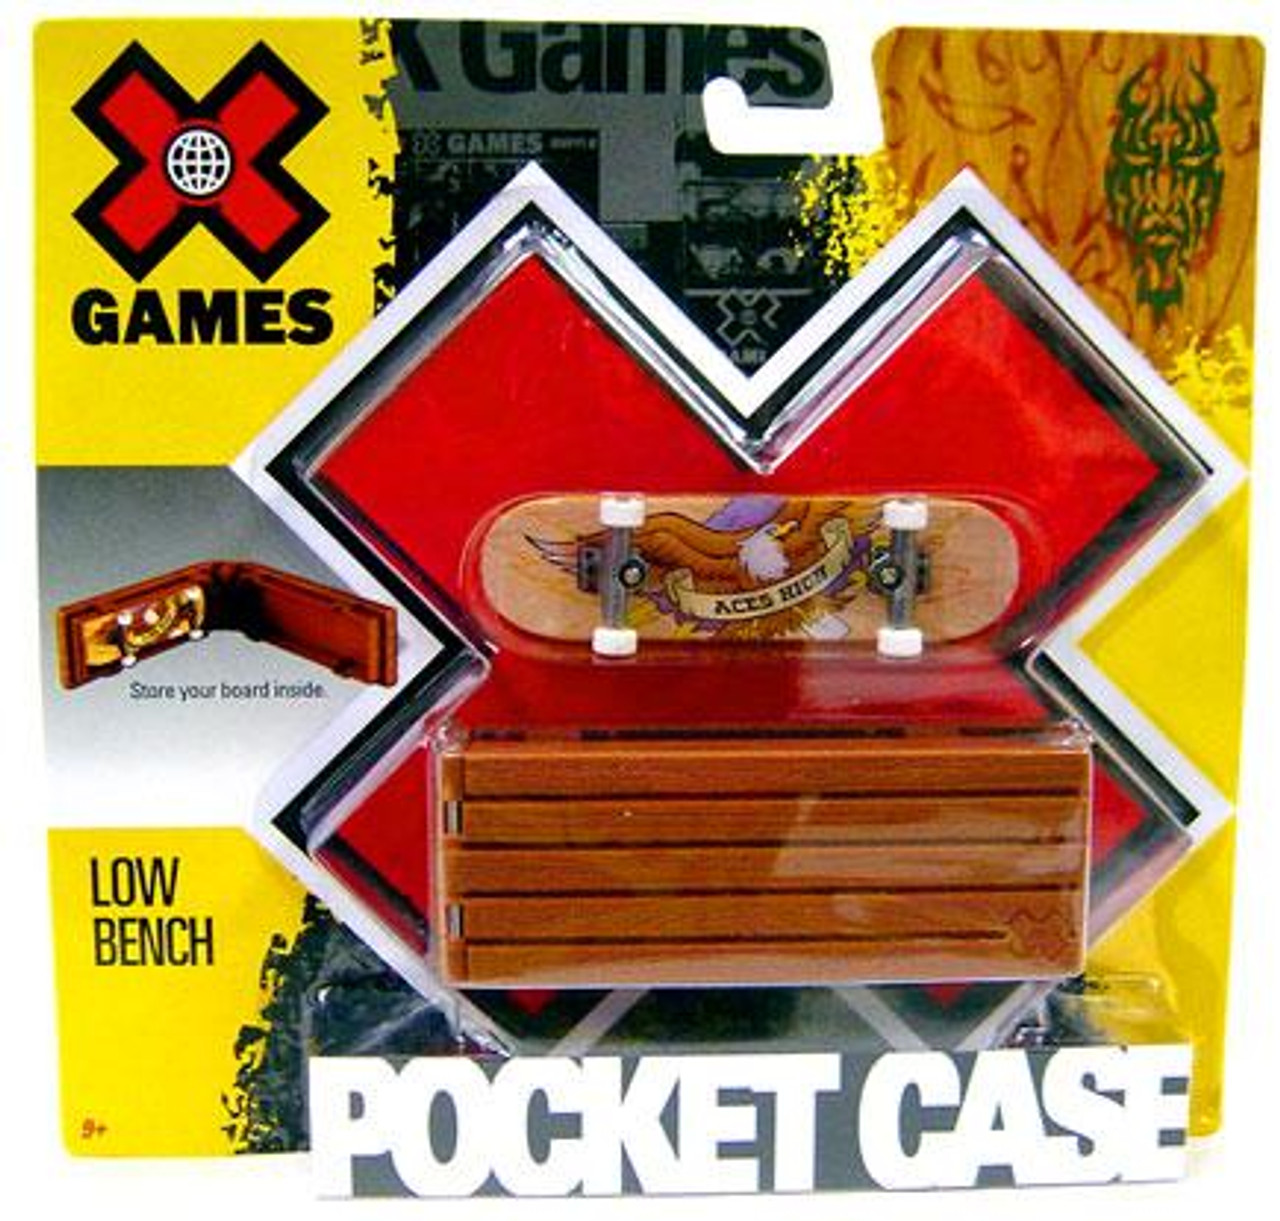 X Games Extreme Sports Low Bench Mini Skateboard Pocket Case